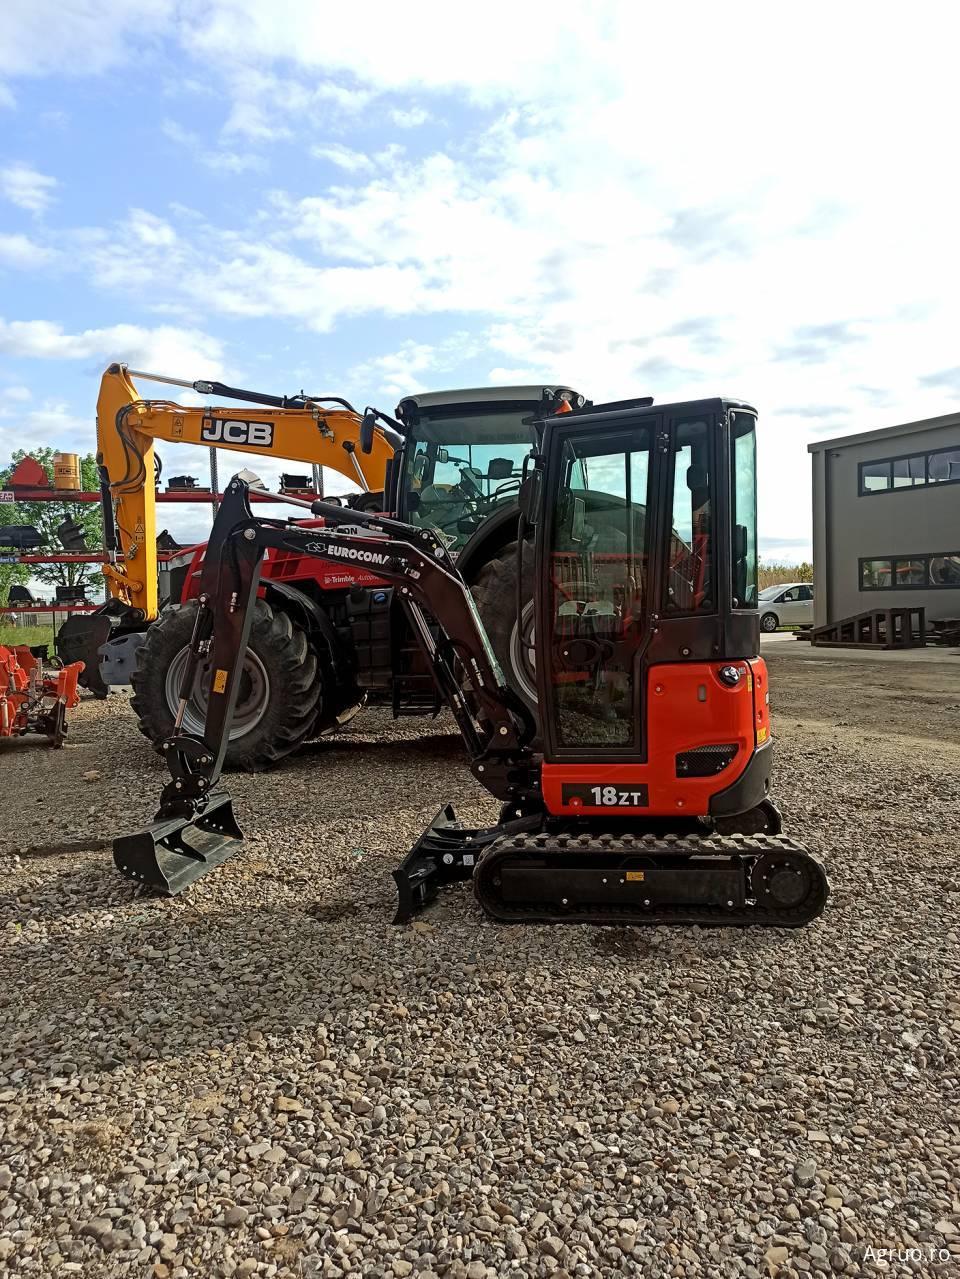 Mini-excavator53269